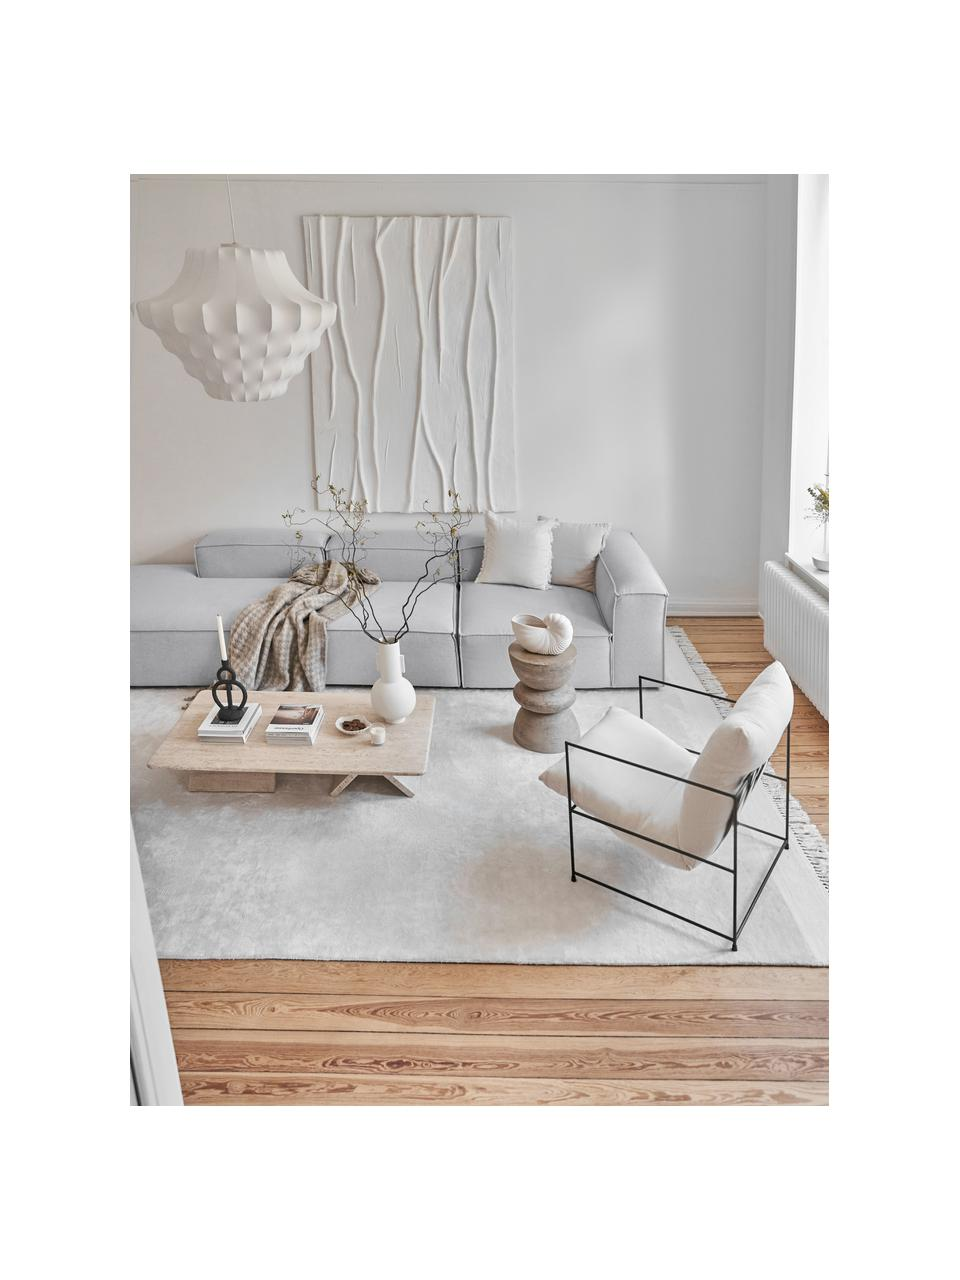 Modulaire XL chaise longue Lennon in lichtgrijs, Bekleding: polyester De hoogwaardige, Frame: massief grenenhout, multi, Poten: kunststof De poten bevind, Geweven stof lichtgrijs, B 357 x D 119 cm